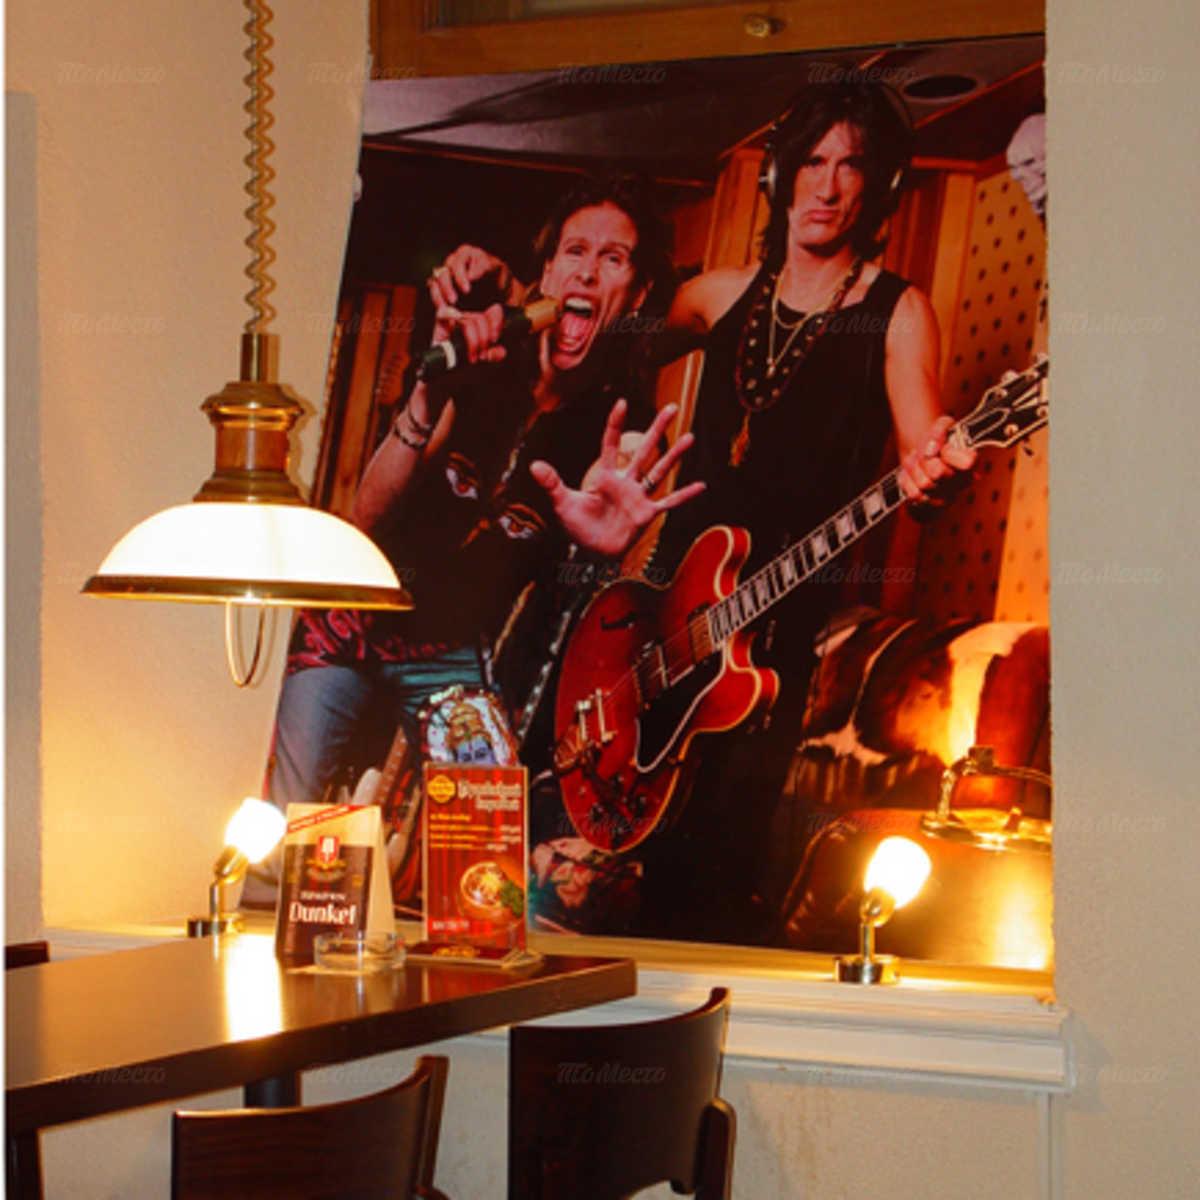 Паб Рок паб (Rock Pub) на Невском проспекте фото 3